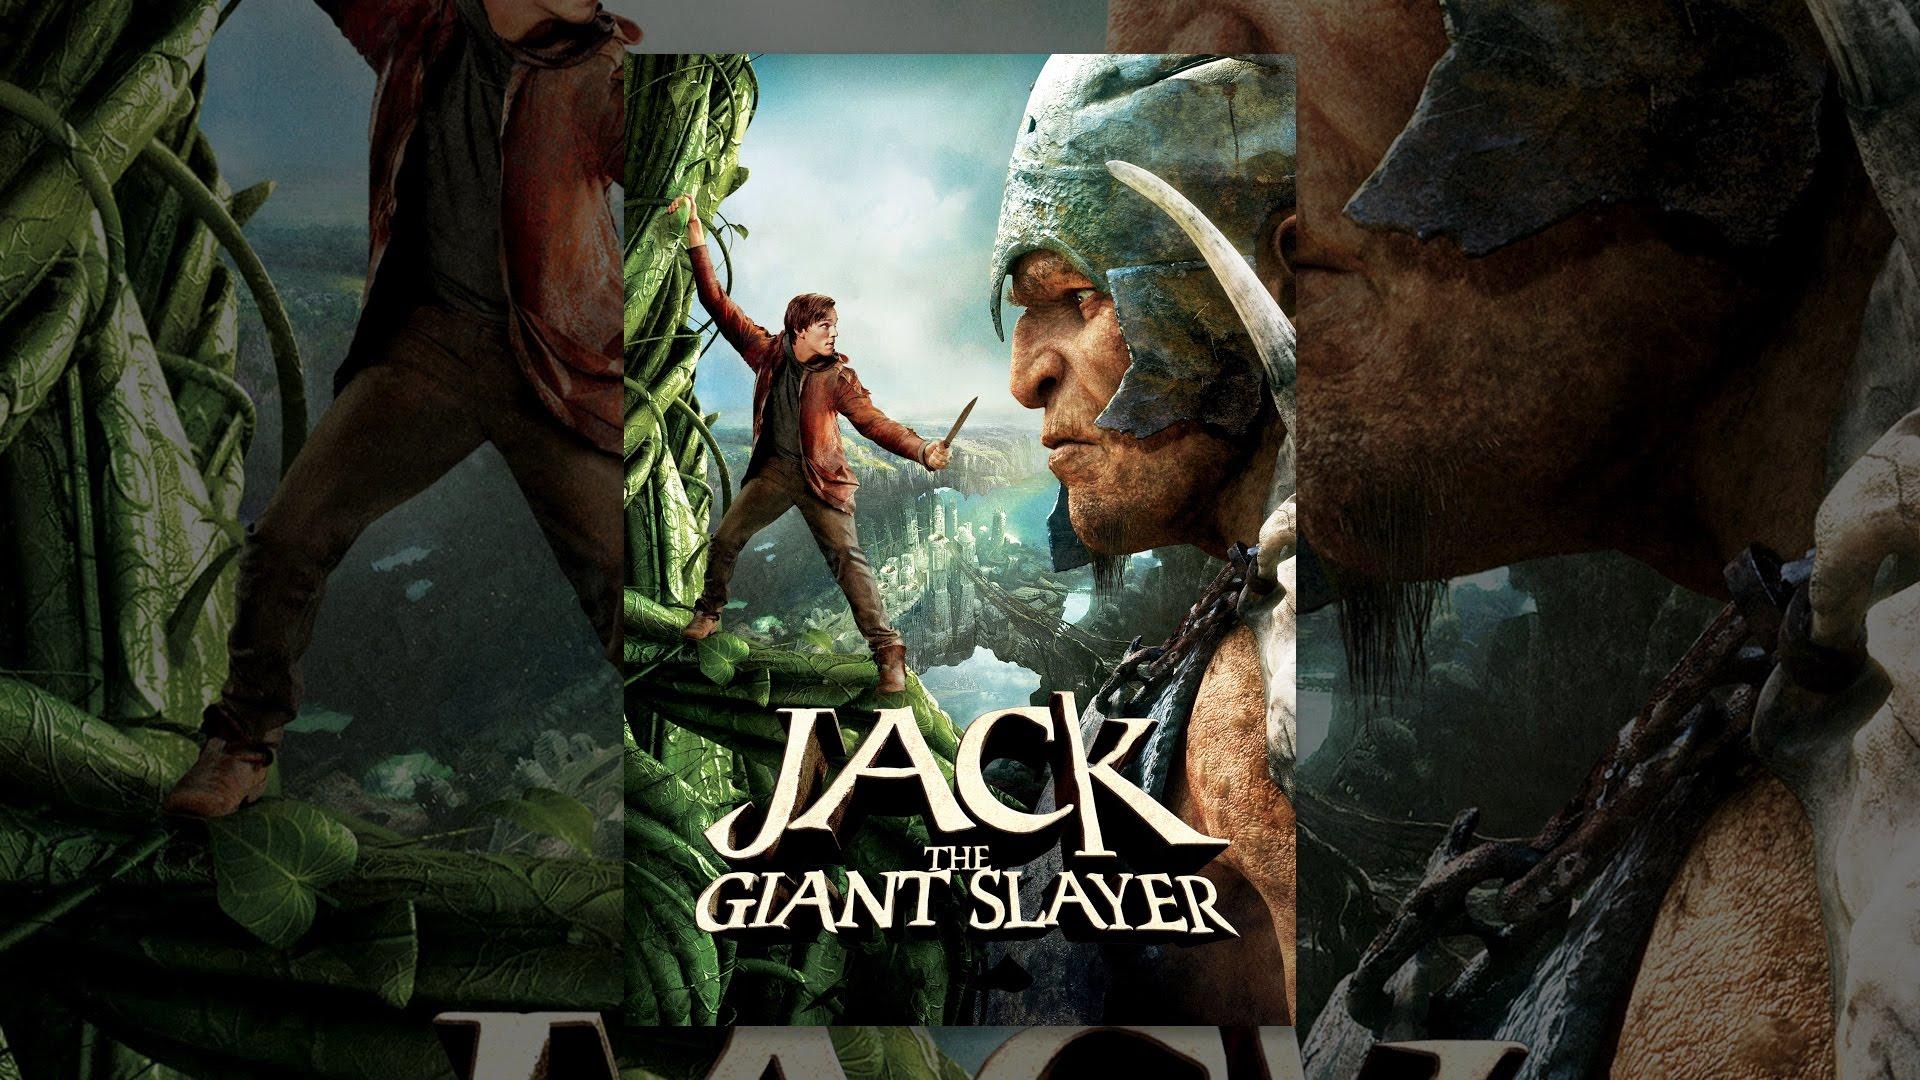 Giant Jack